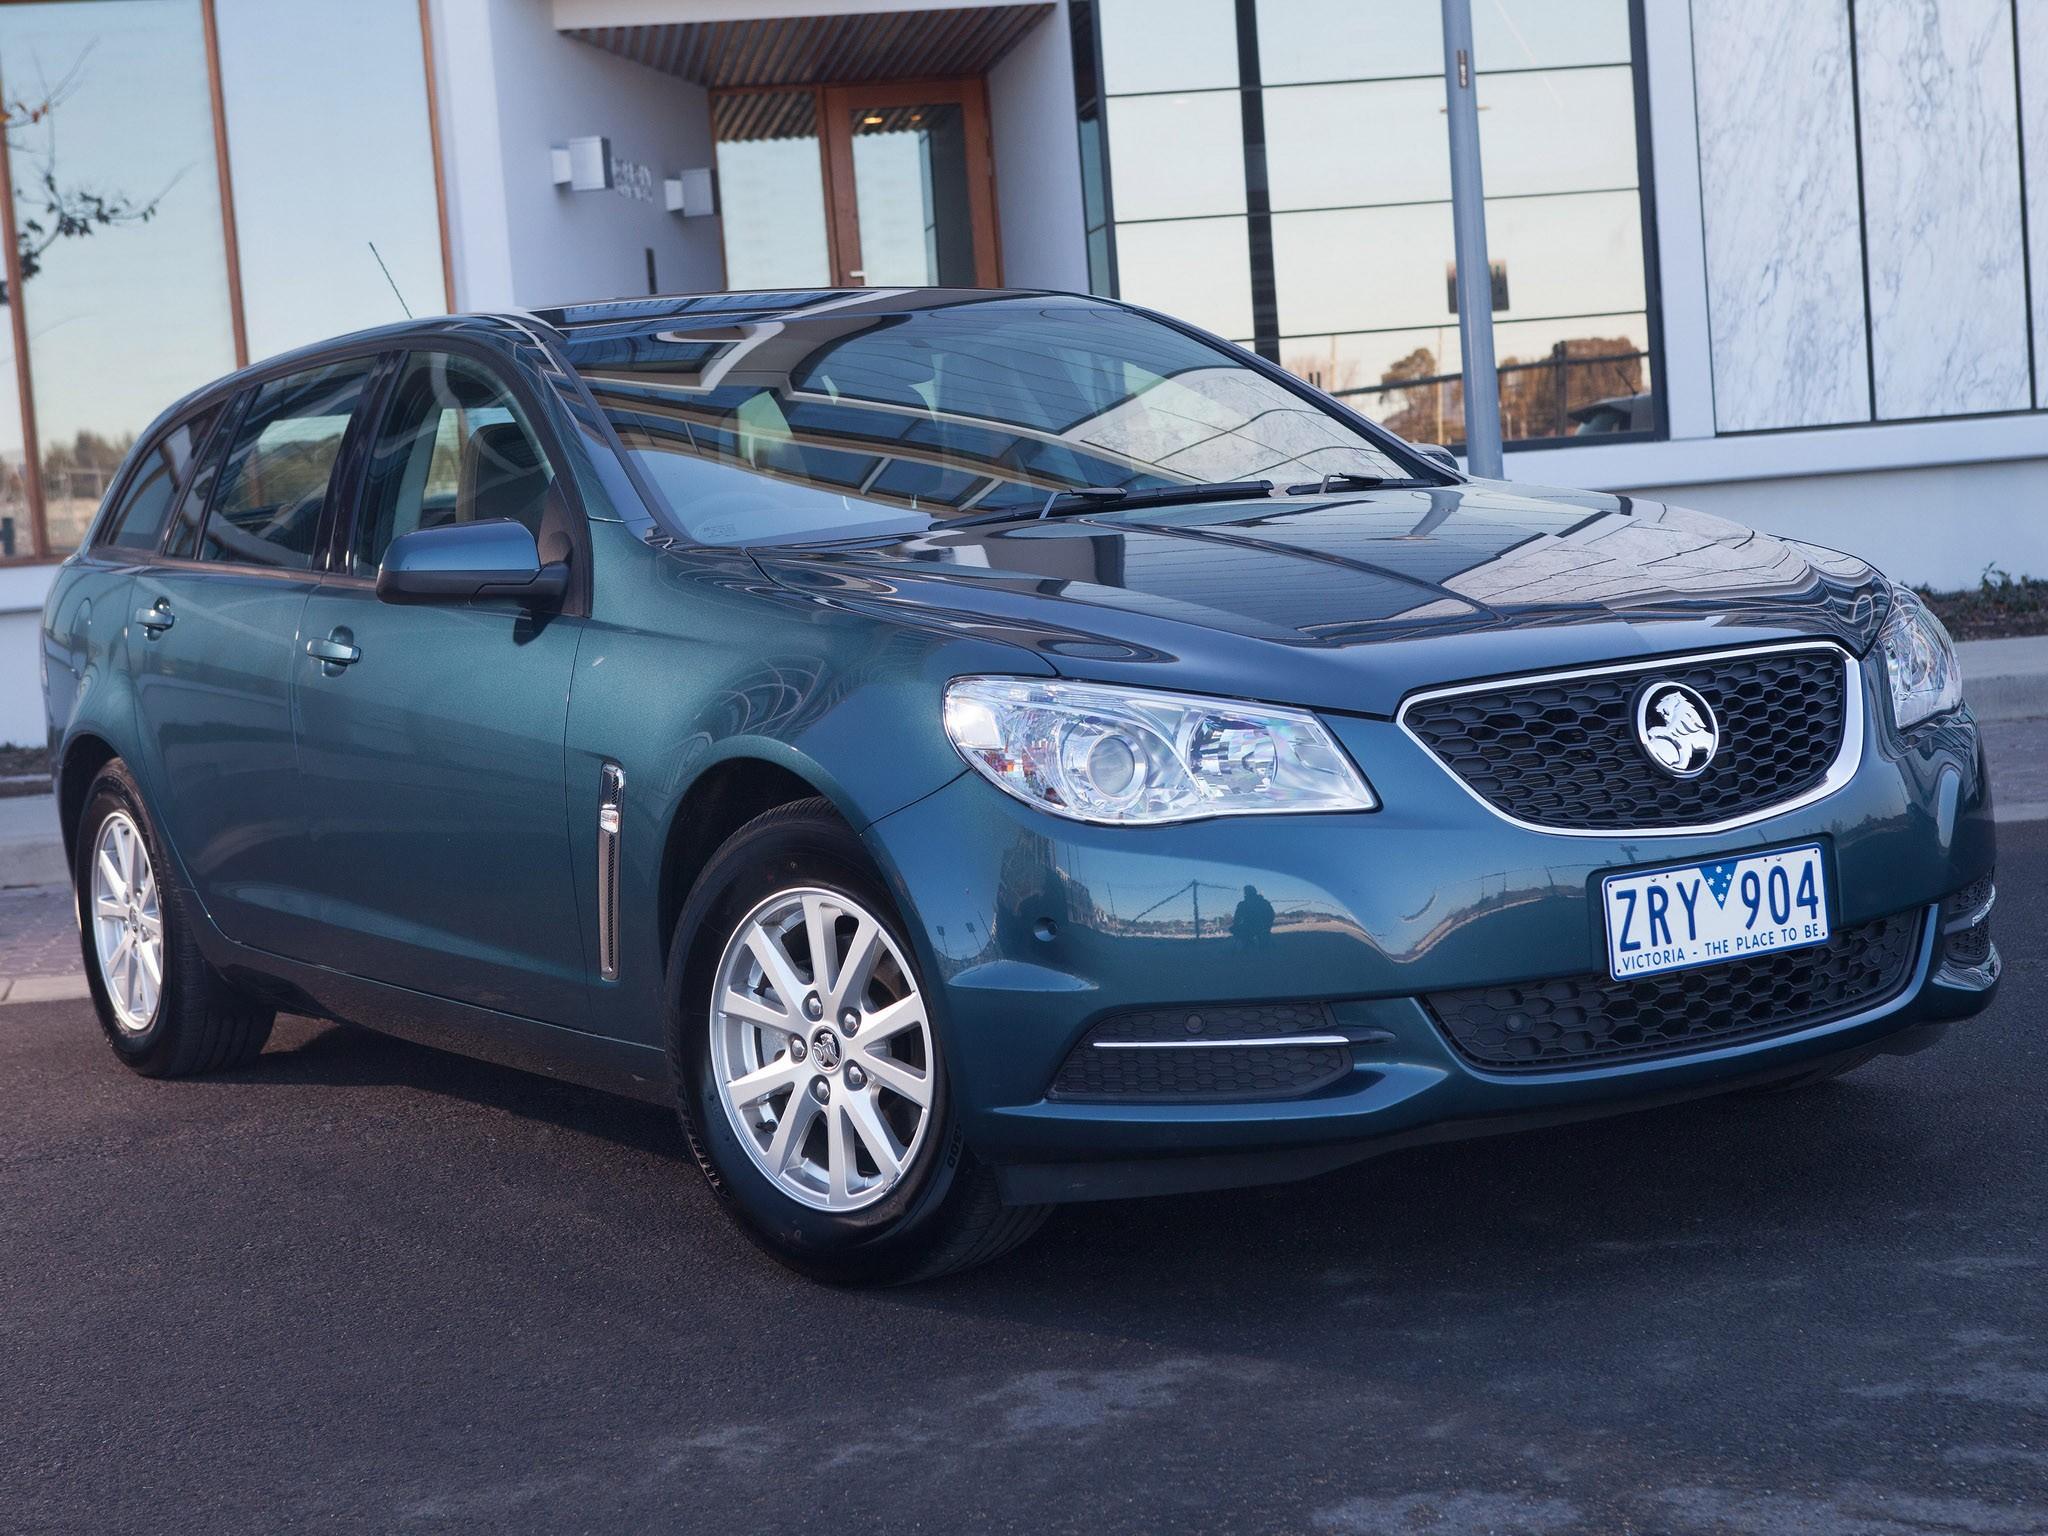 2013 Holden Commodore Evoke Sport wagon